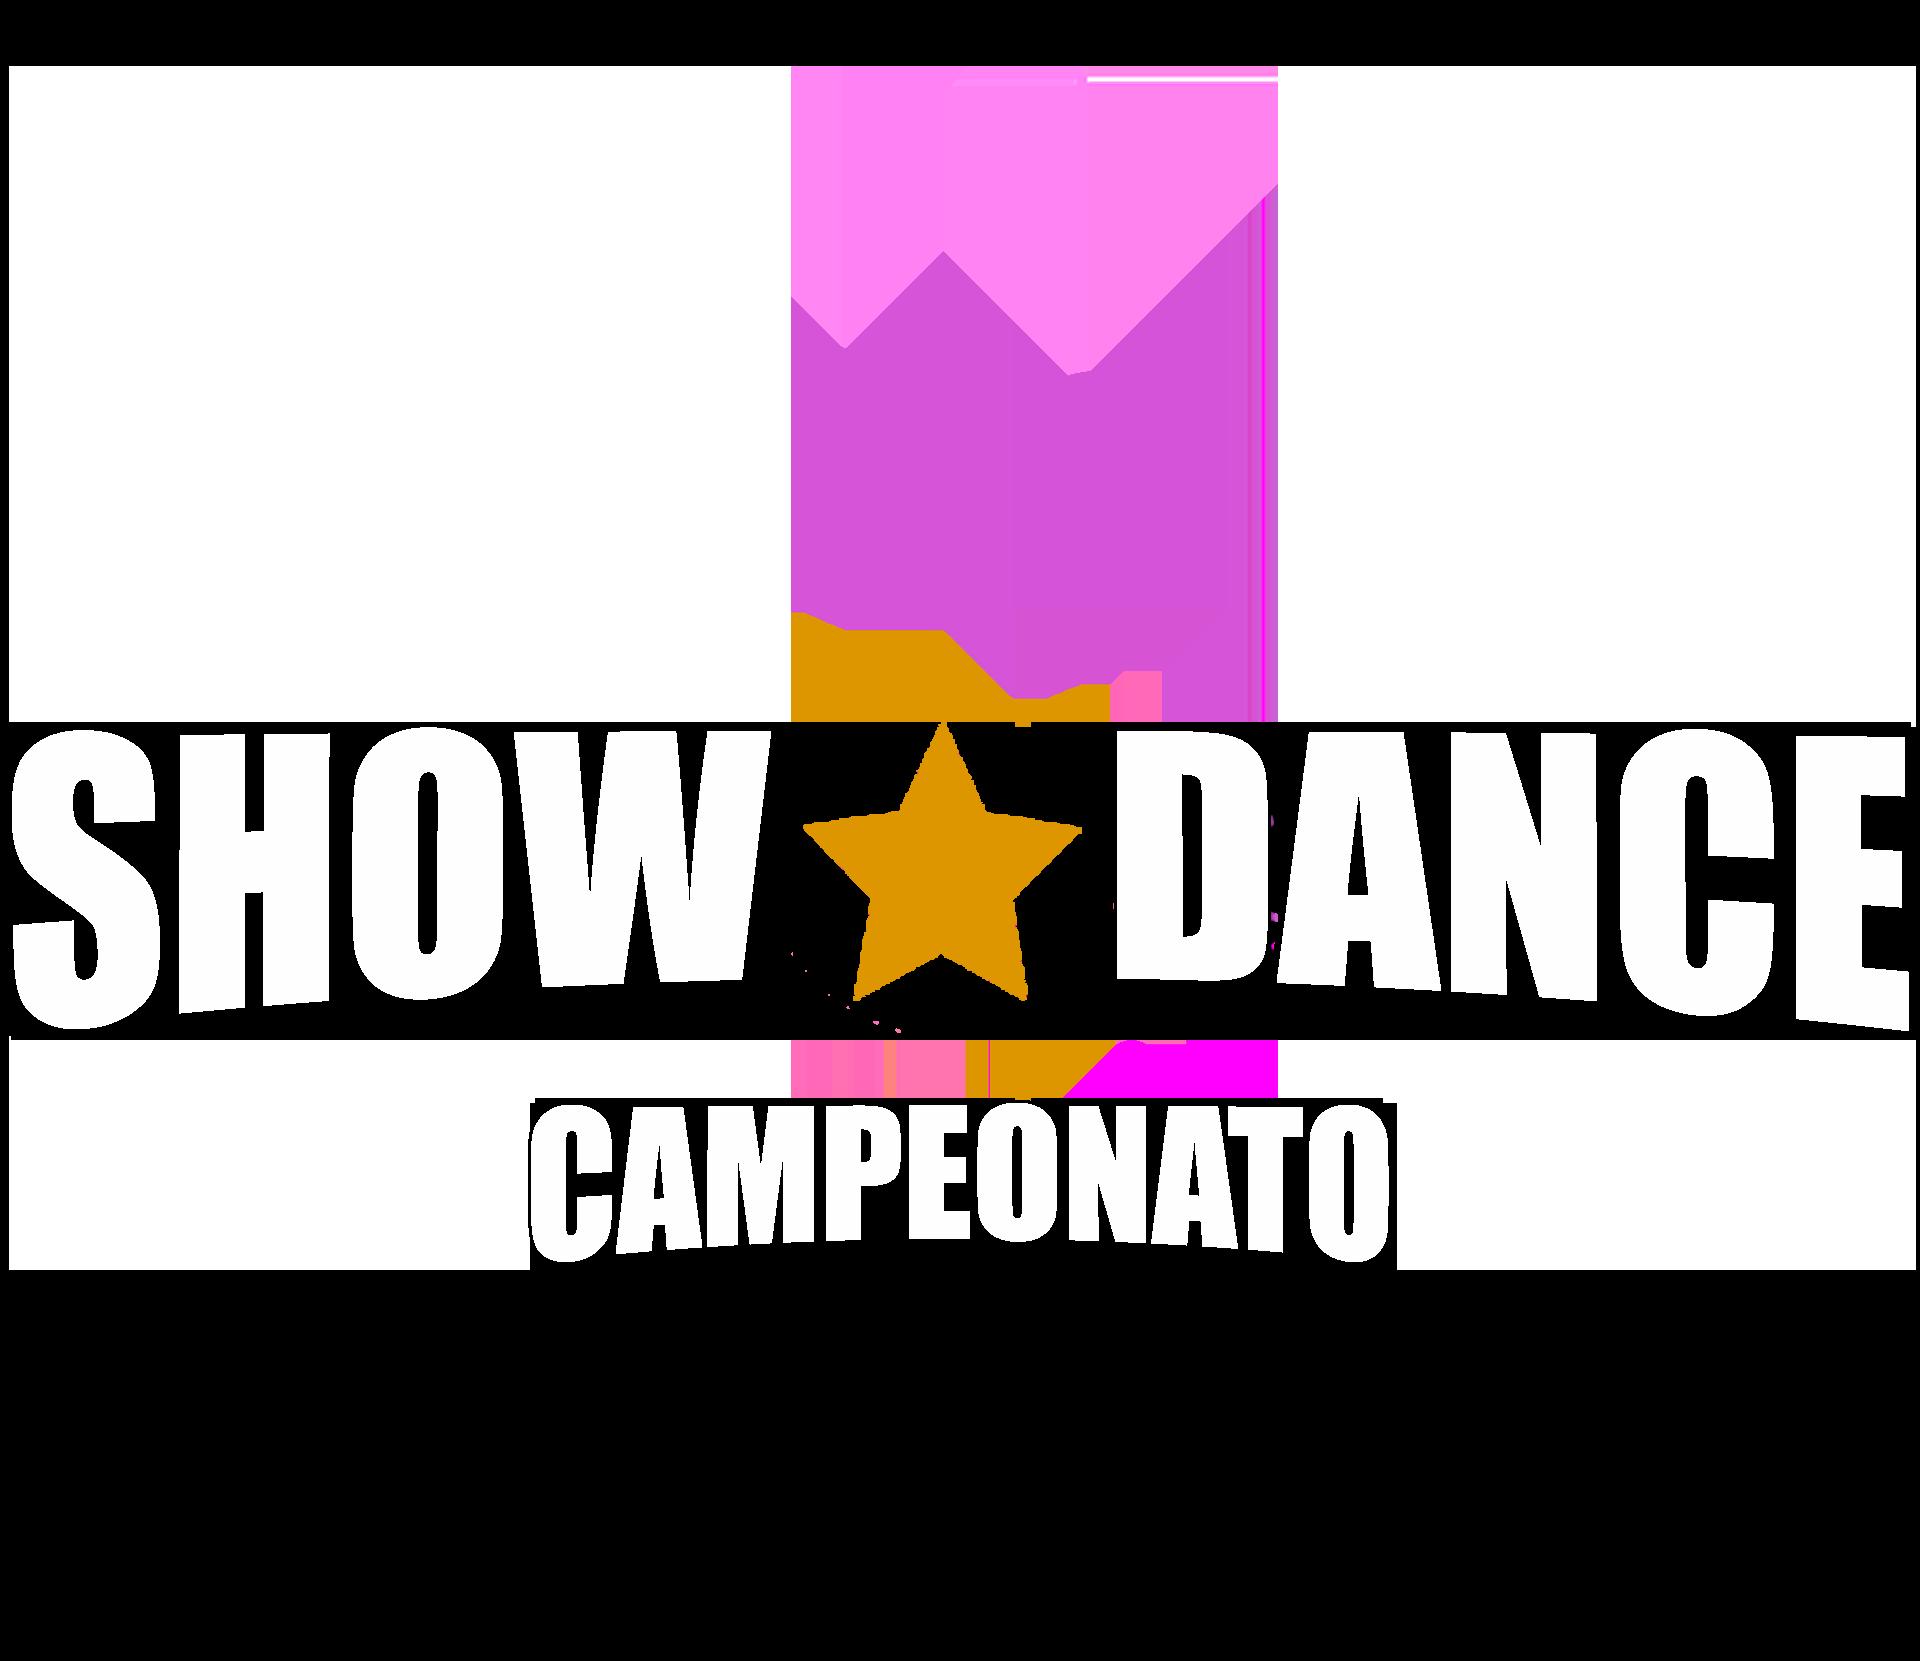 CAMPEONATO SHOW DANCE